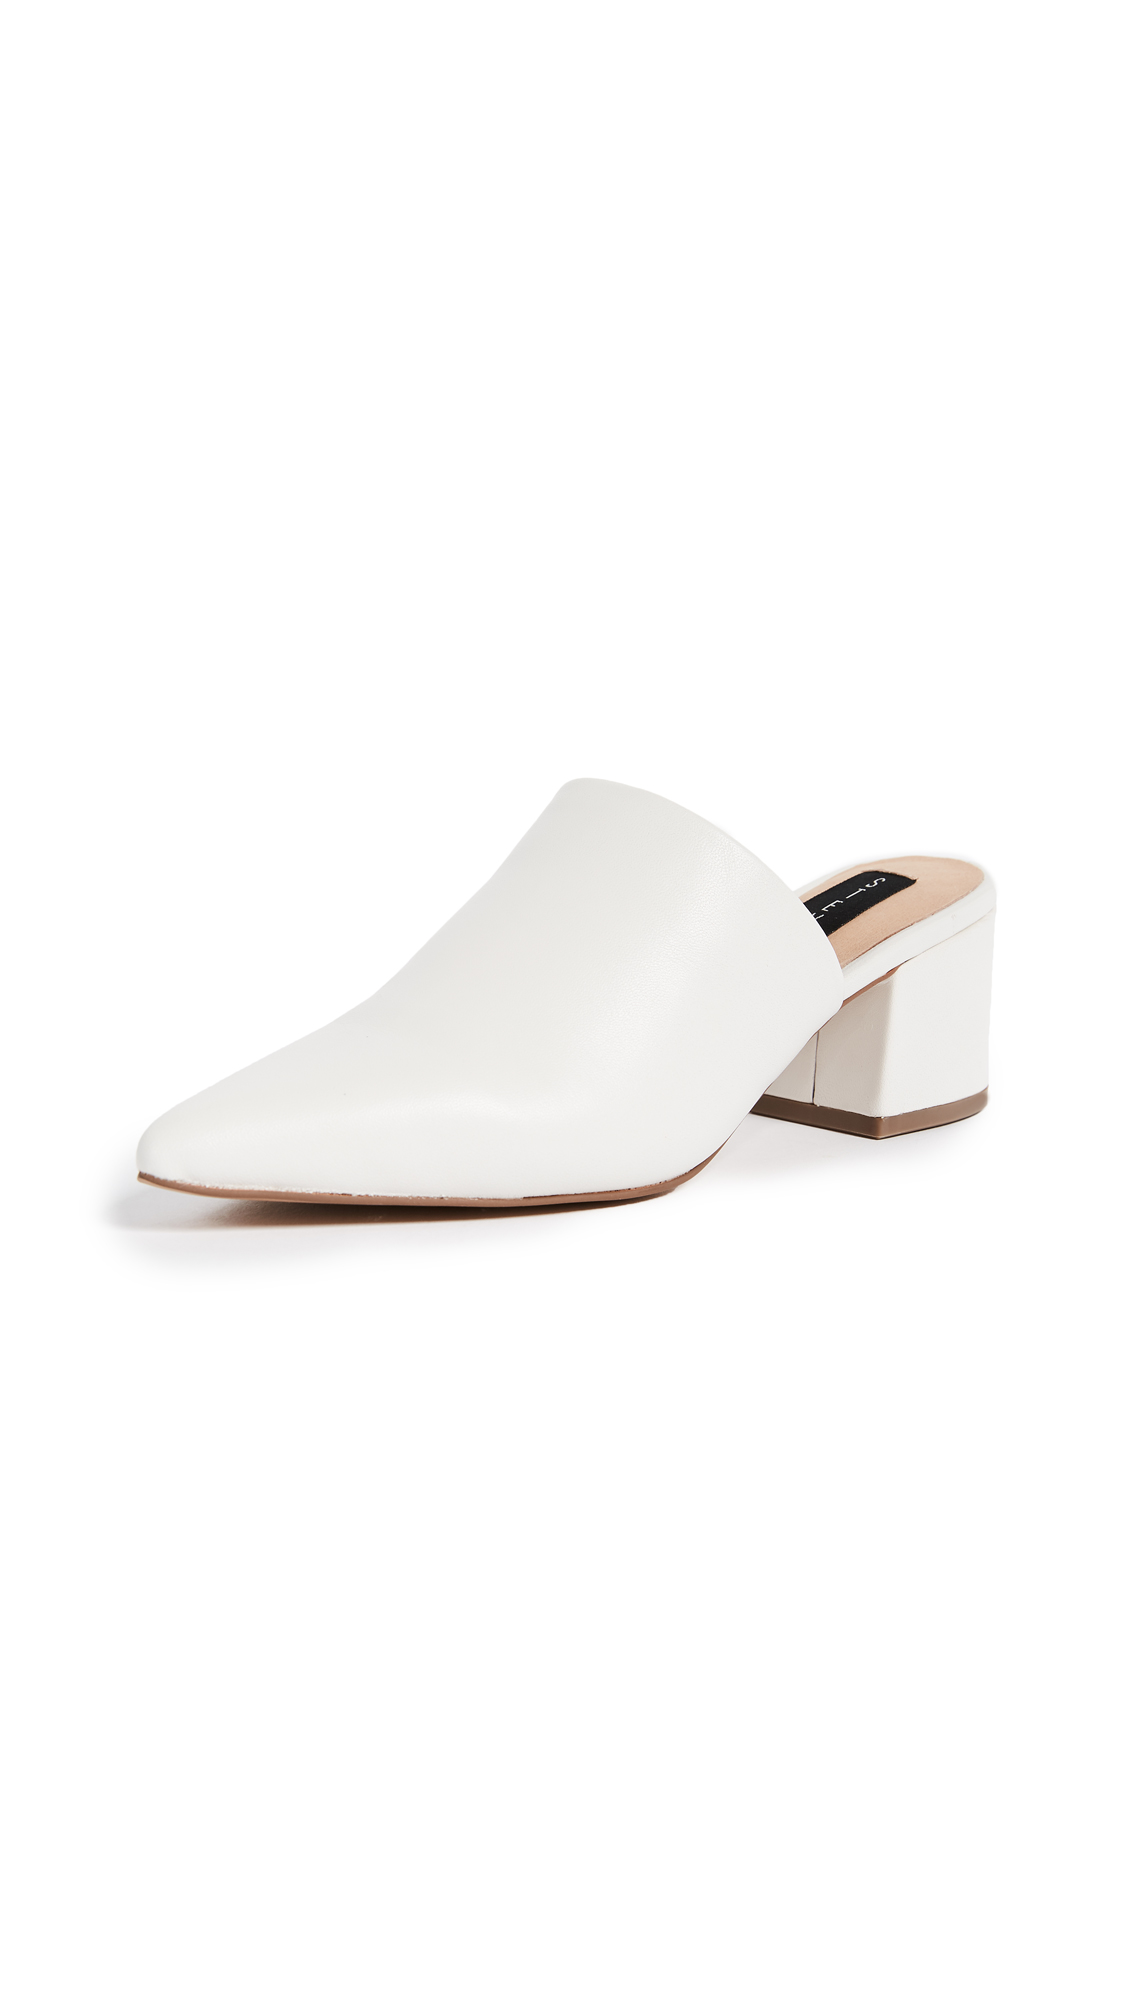 Steven Simone Block Heel Pumps - White